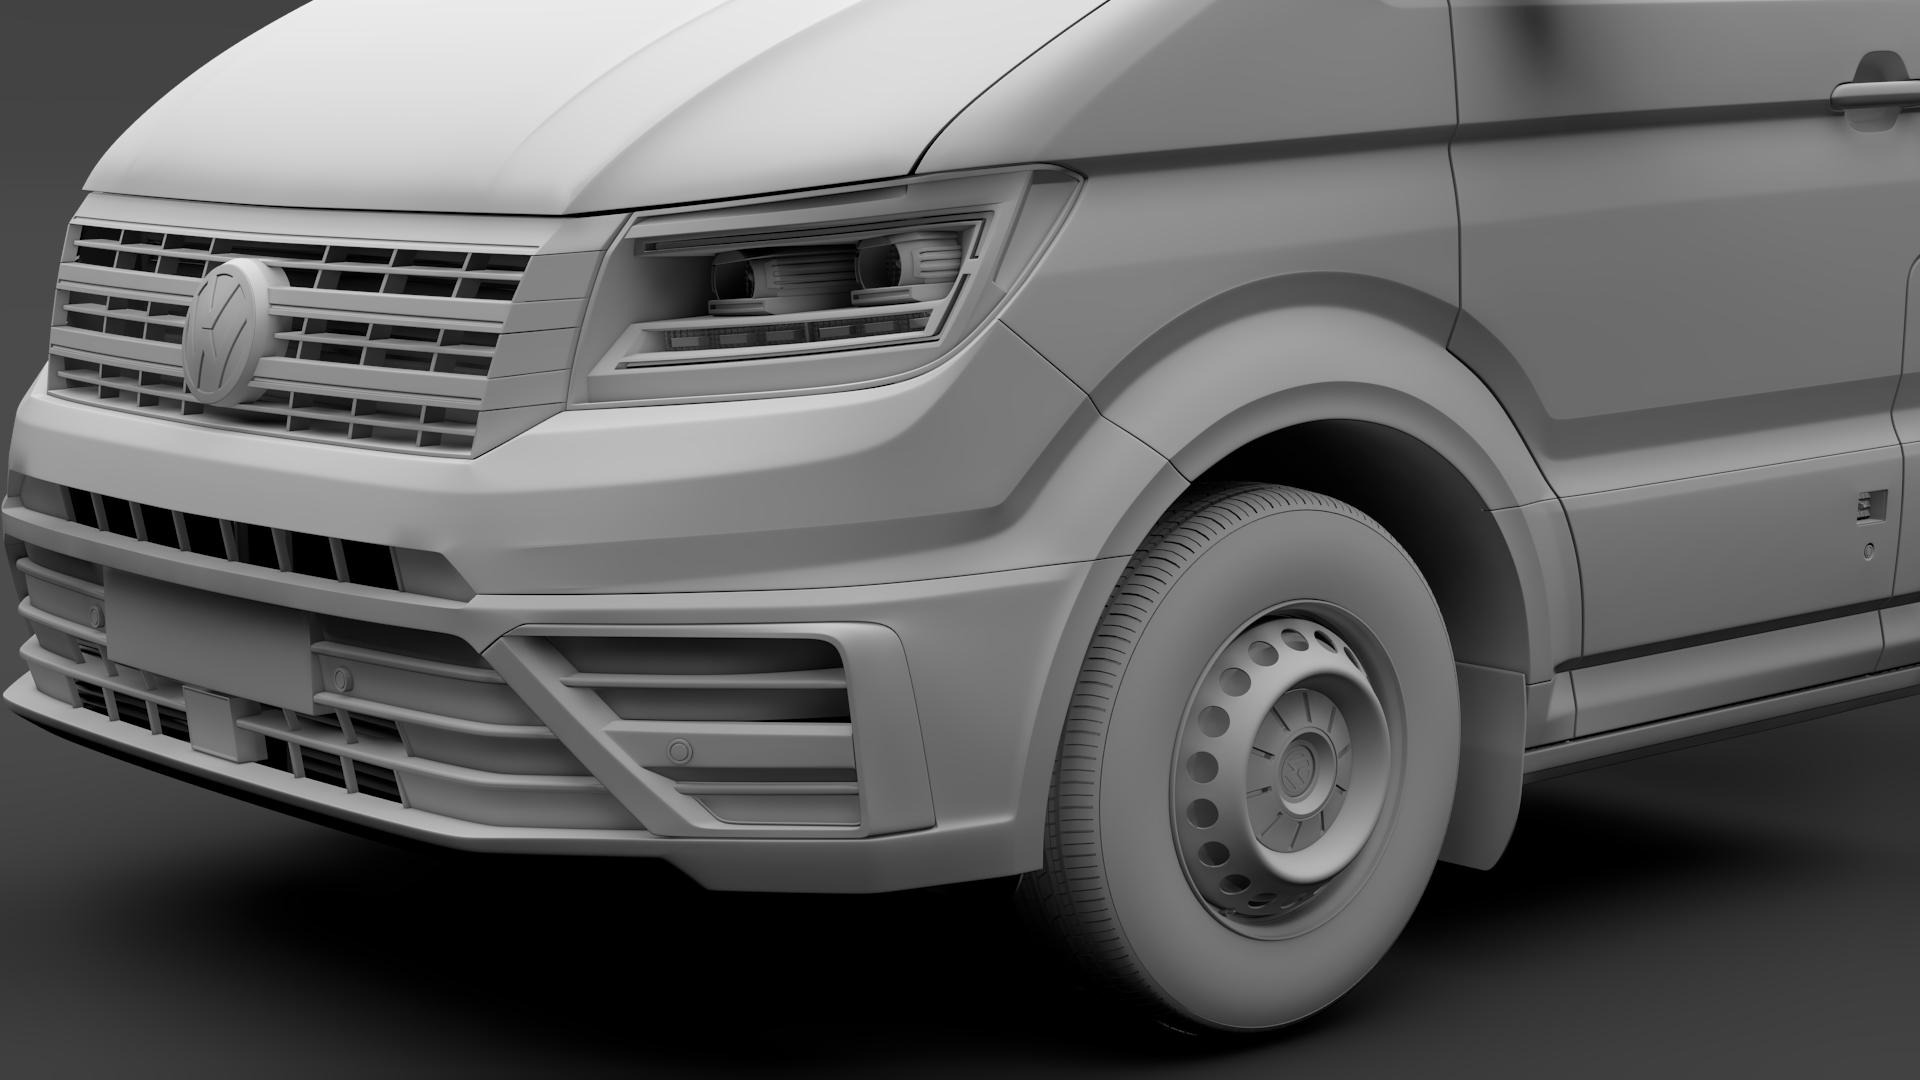 wv crafter chassis single-cab 2017 3d model max fbx c4d lwo ma mb hrc xsi obj 275106